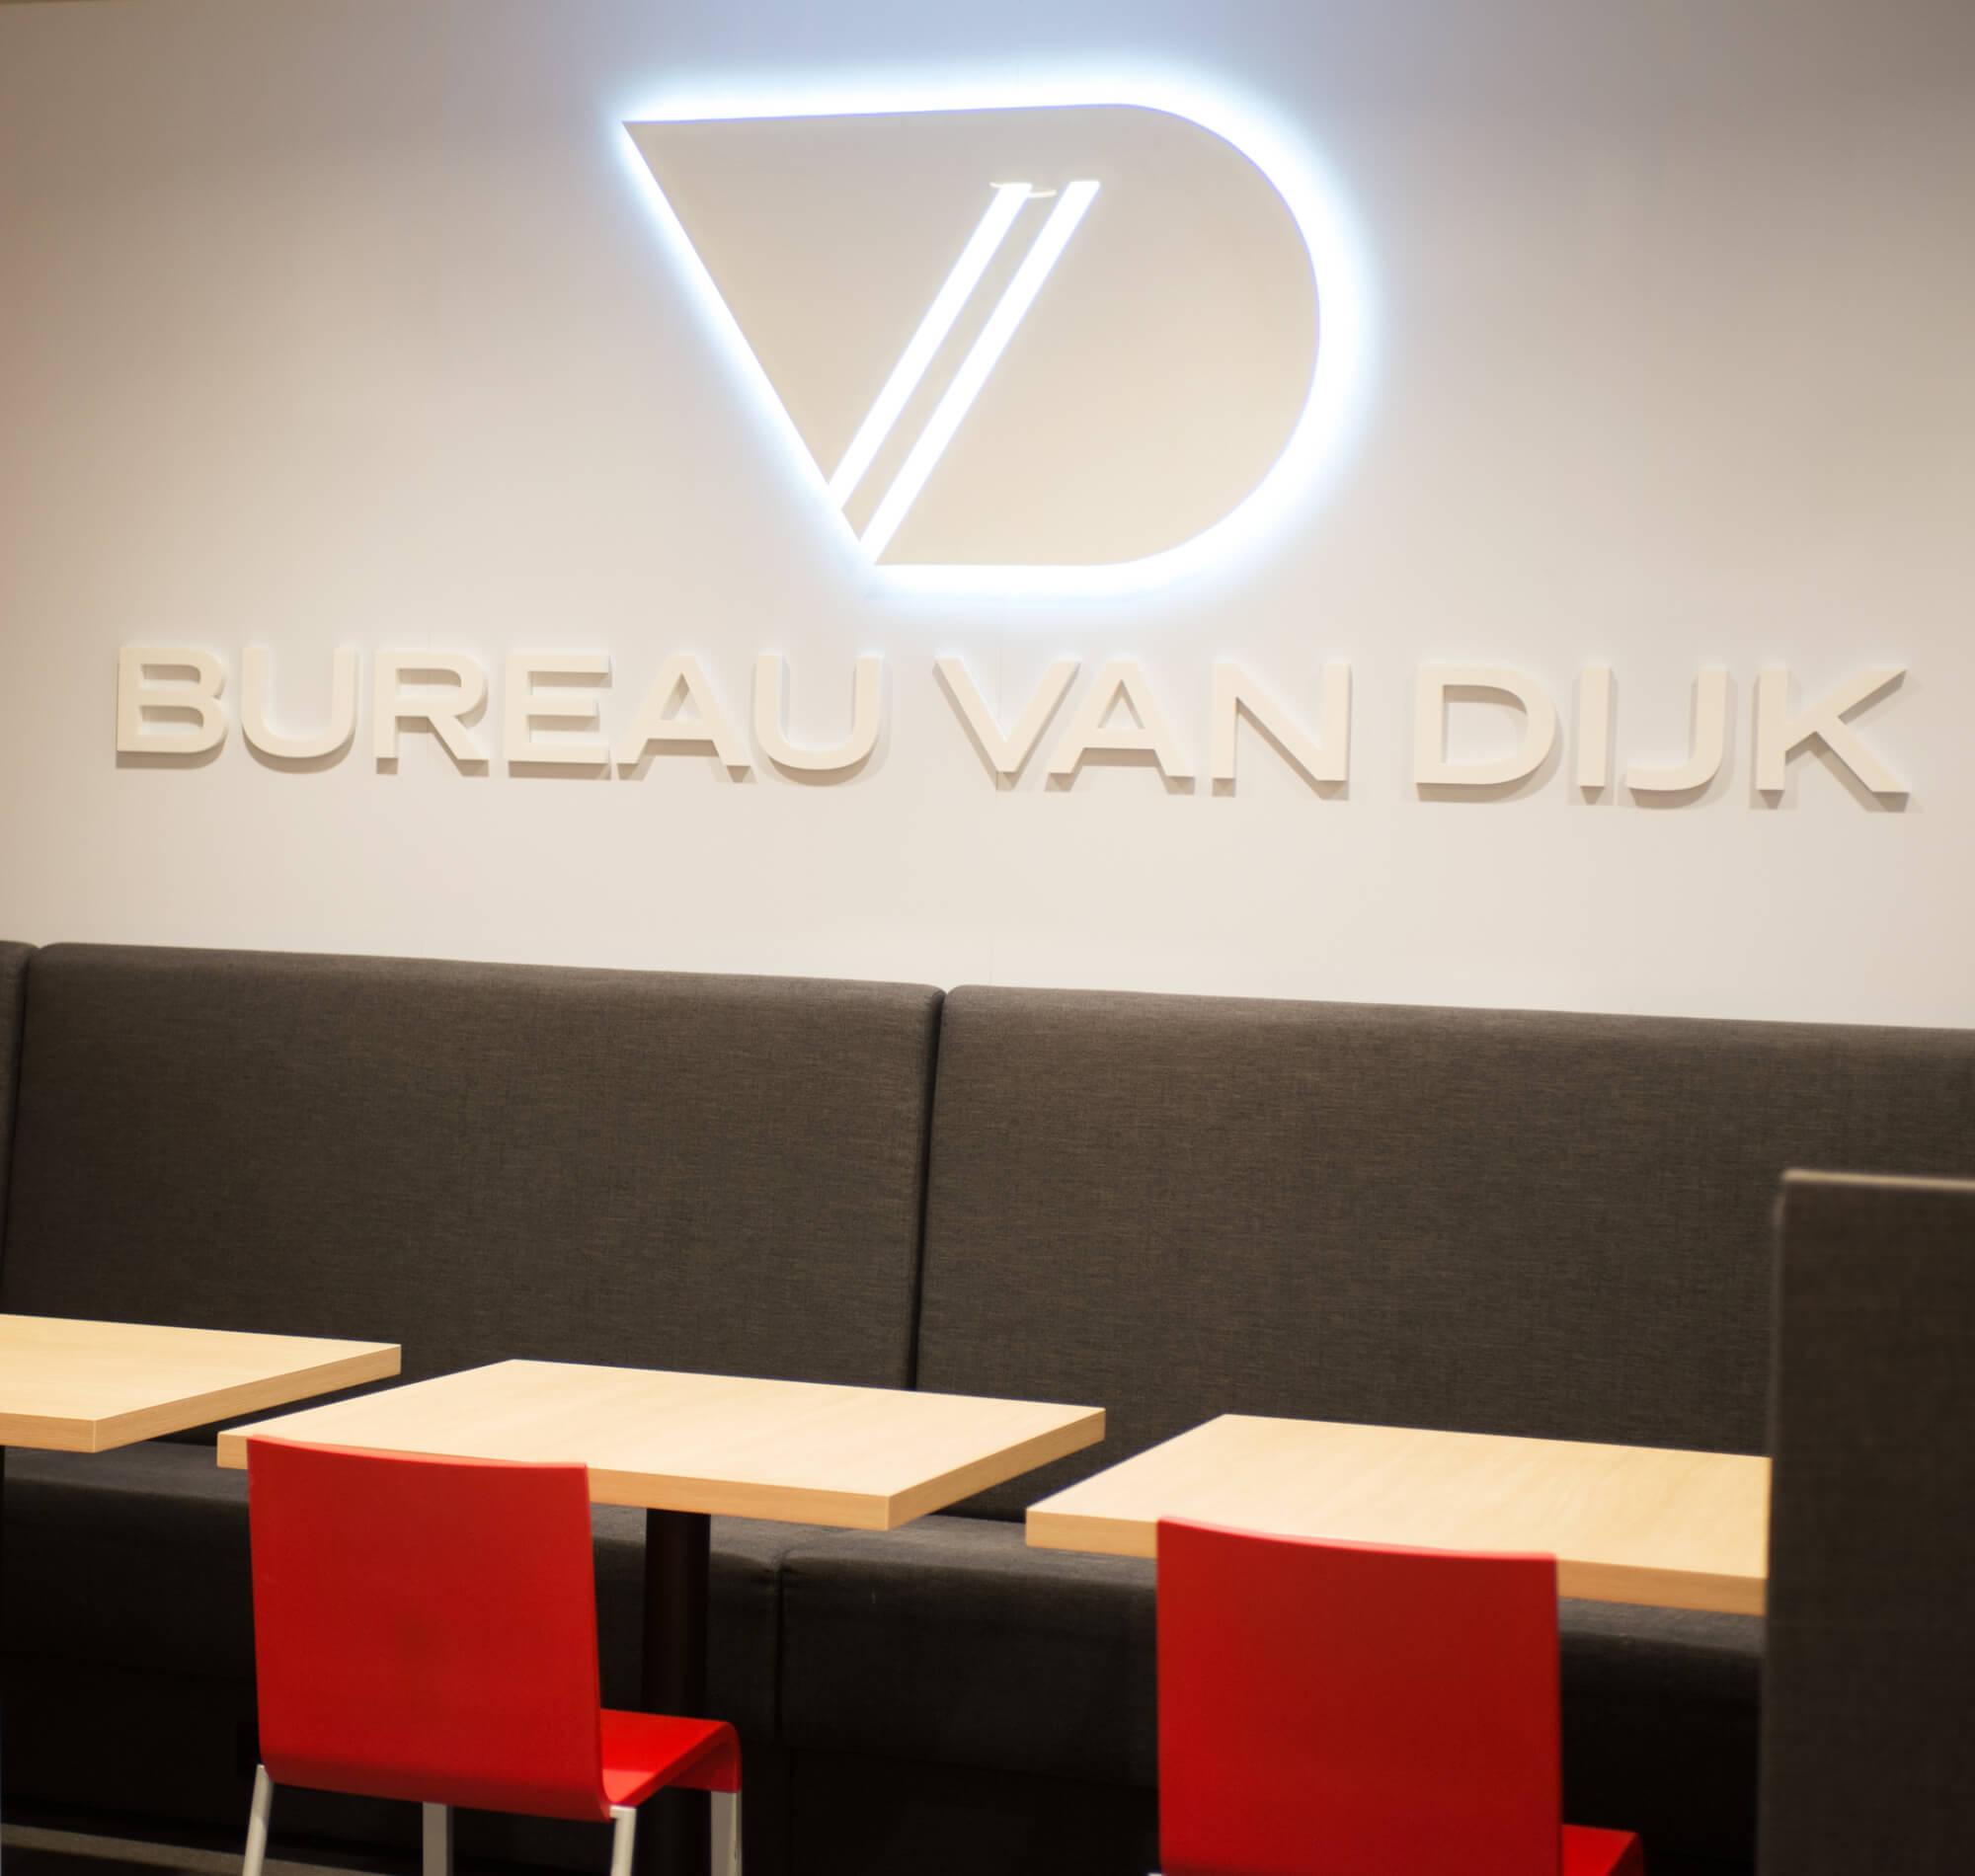 Bureau van Dijk1